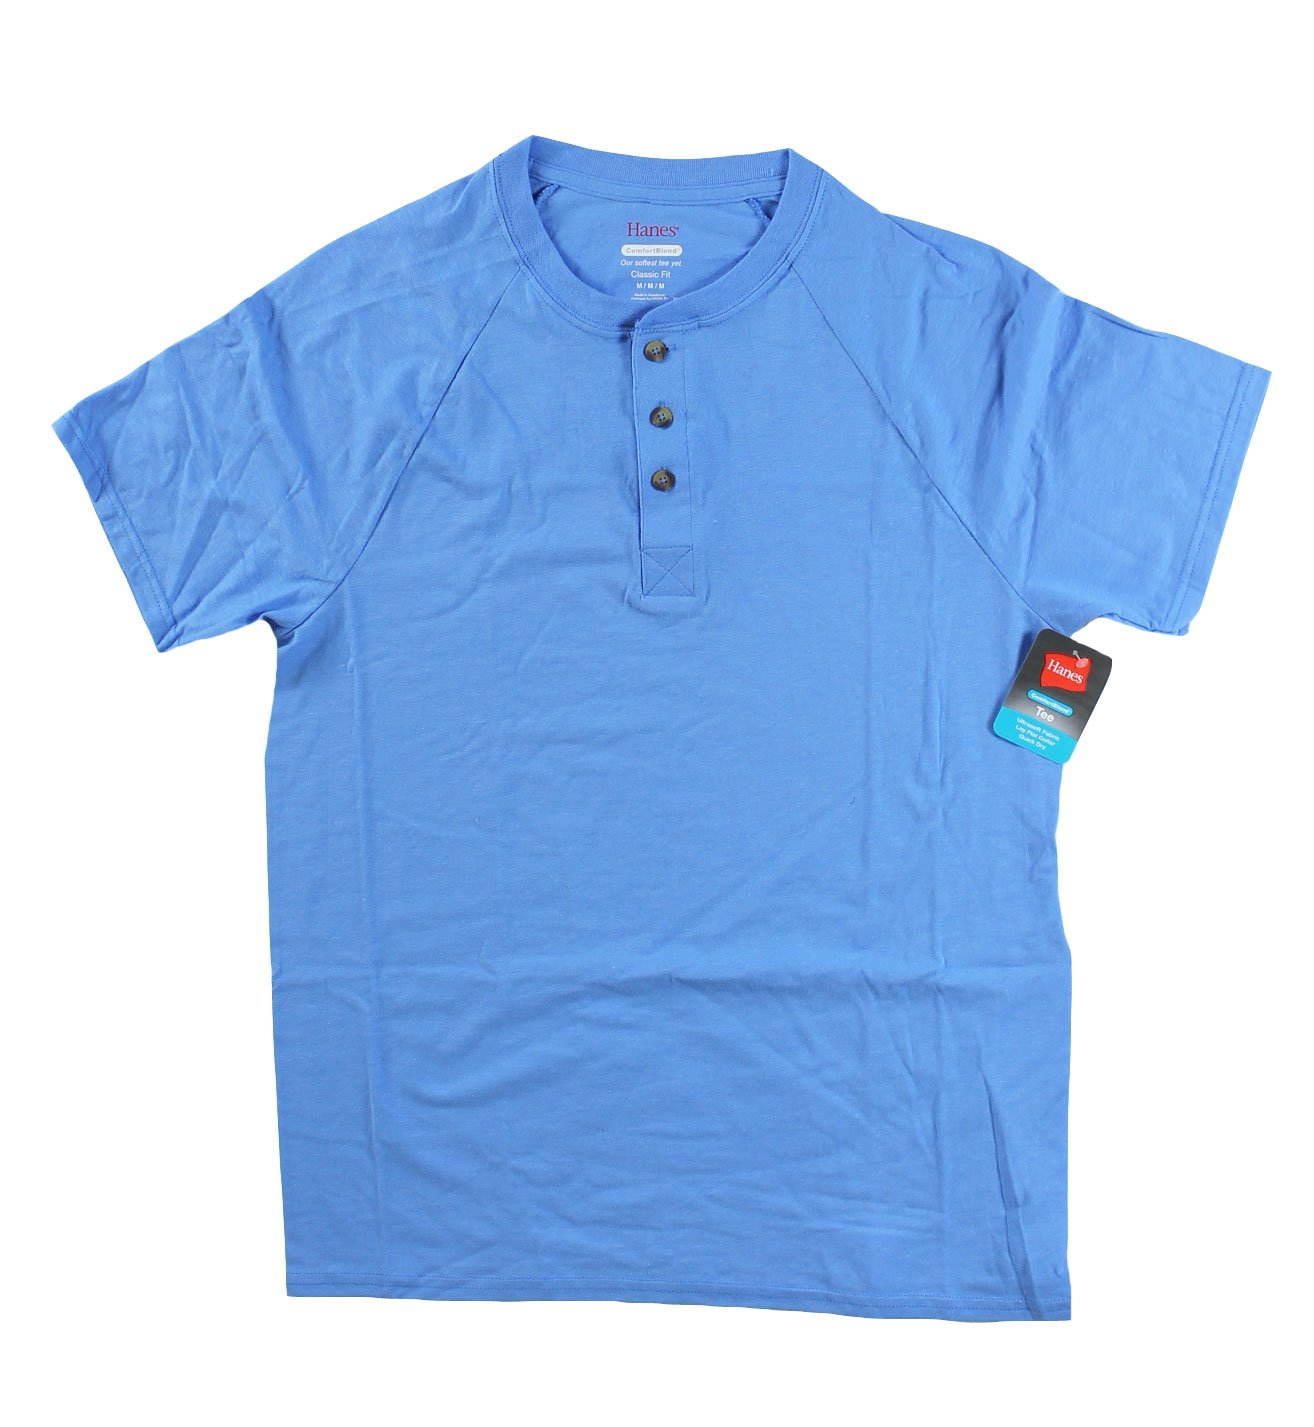 Hanes Men's Tagless Crewneck T-shirt (Pack of 5) (Medium, Blue Henly (X-Temp)) by Hanes